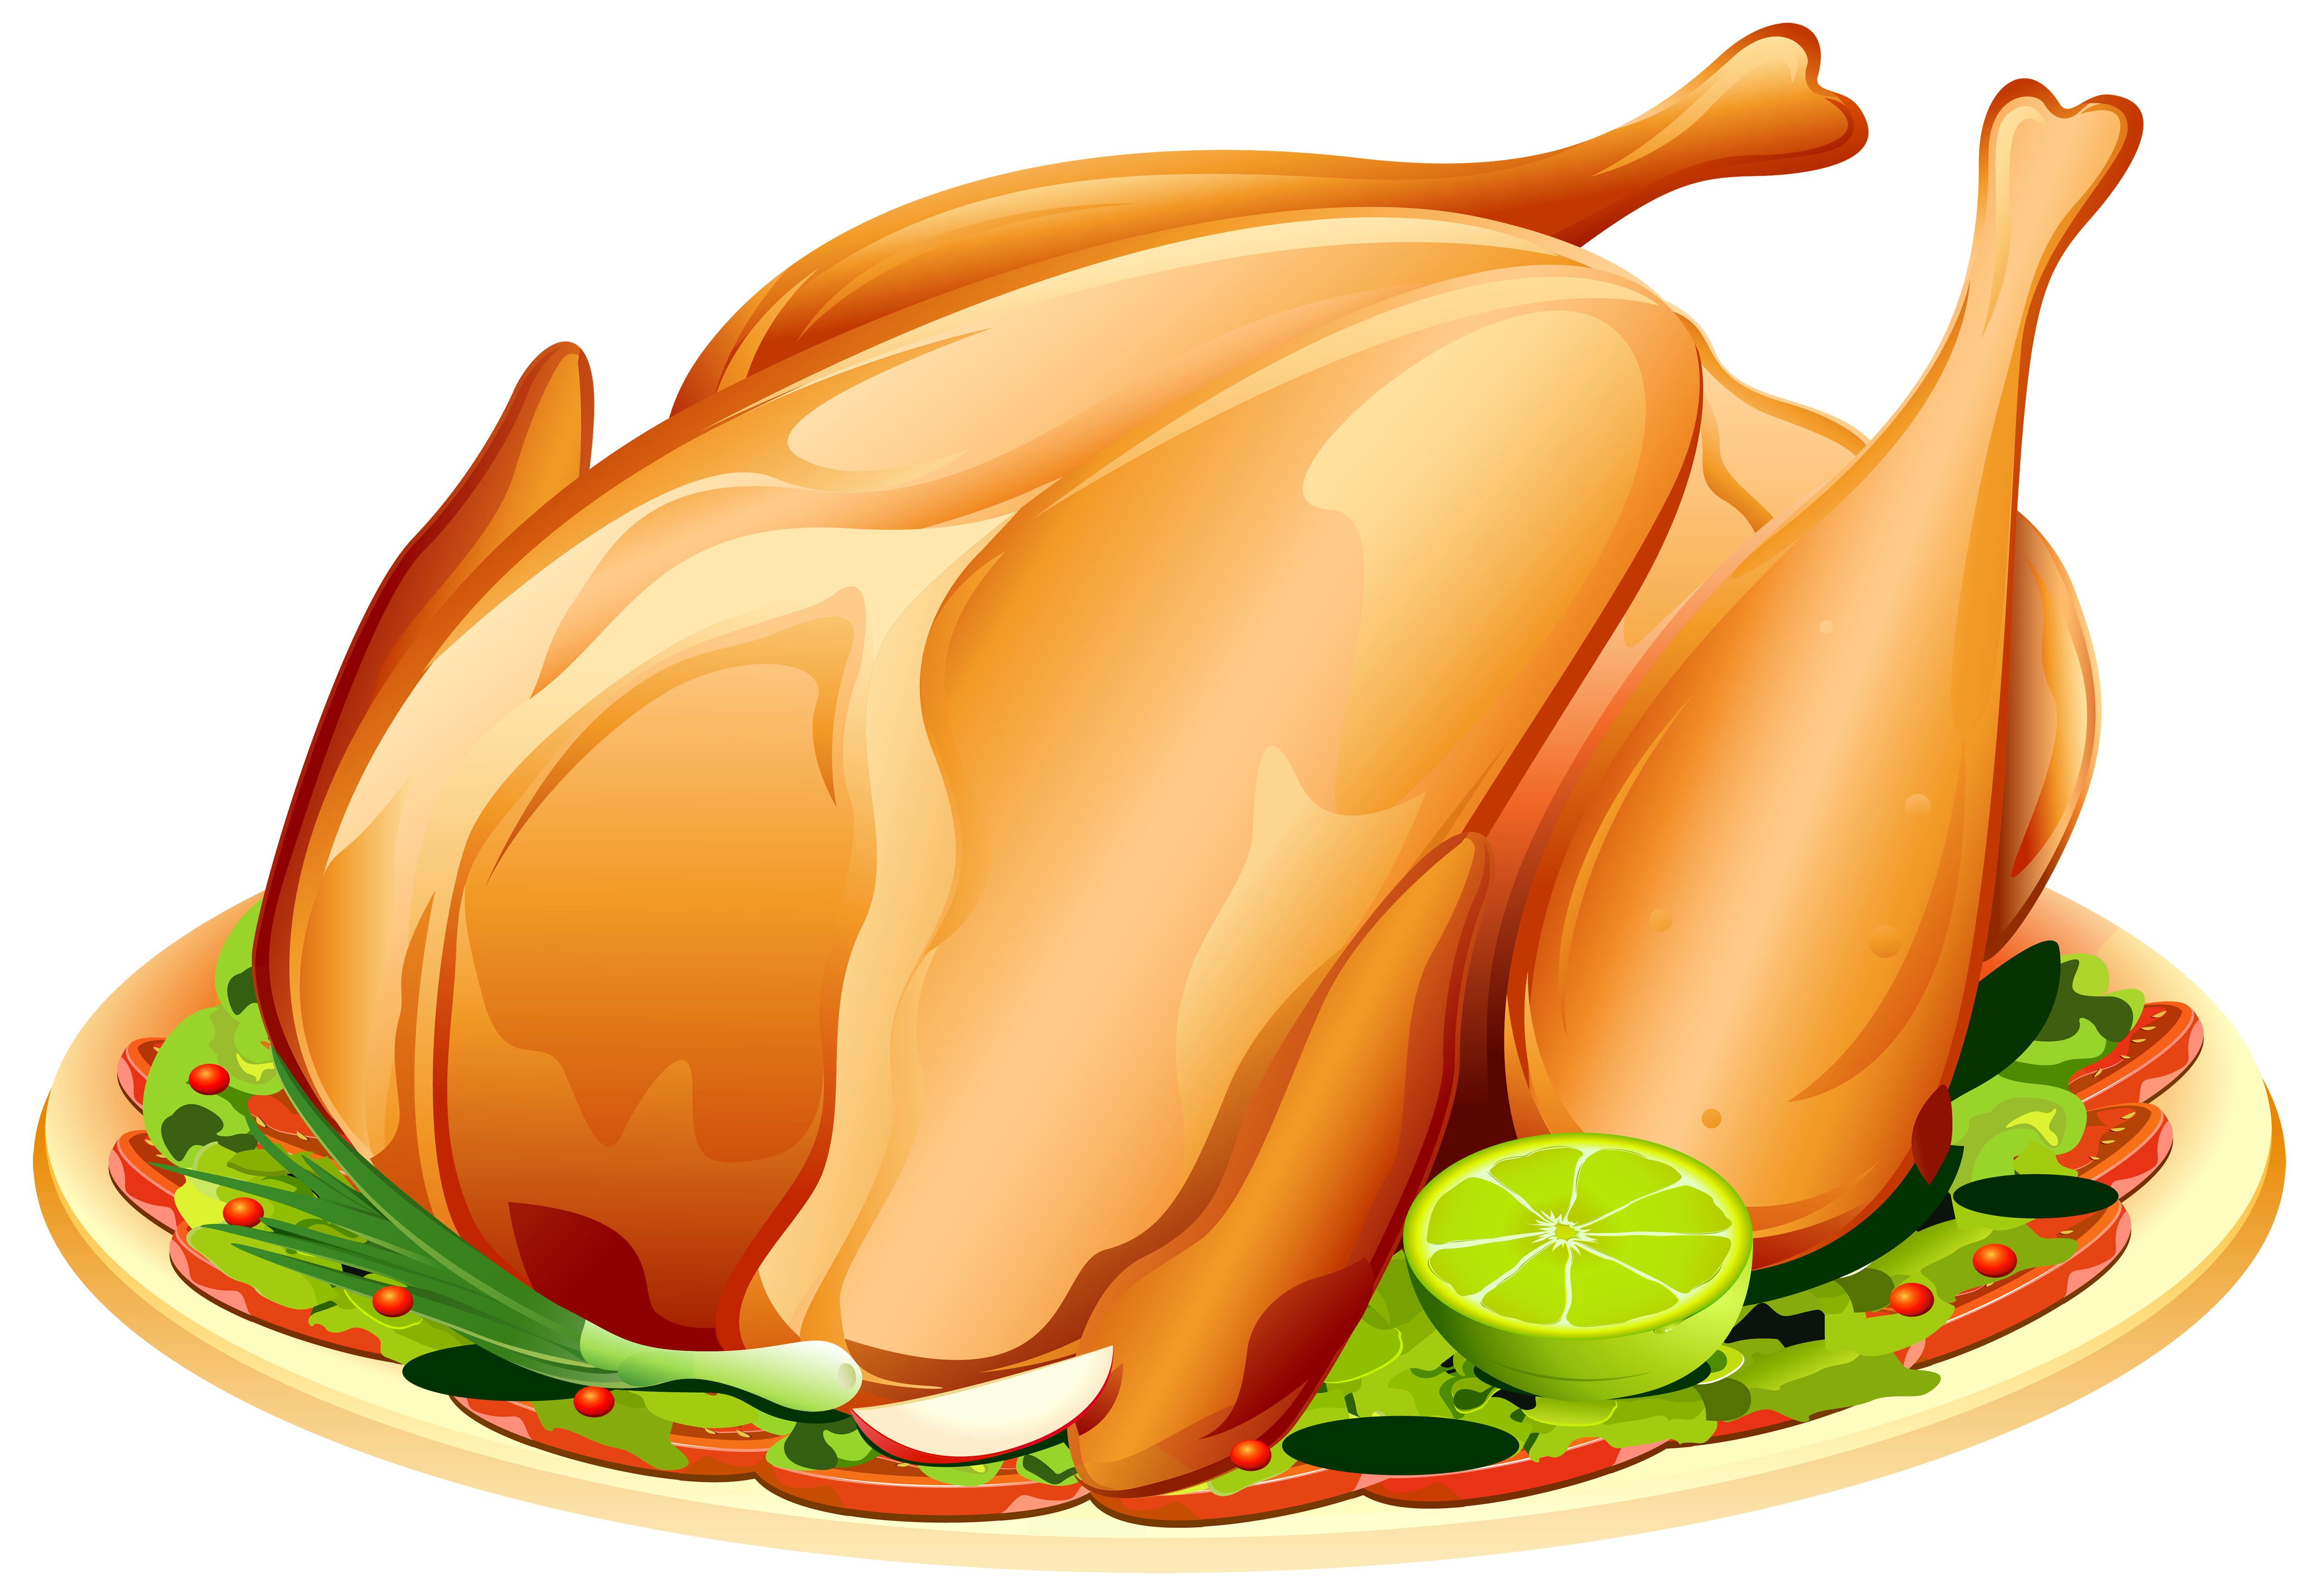 Roast Turkey PNG Clipart Image.